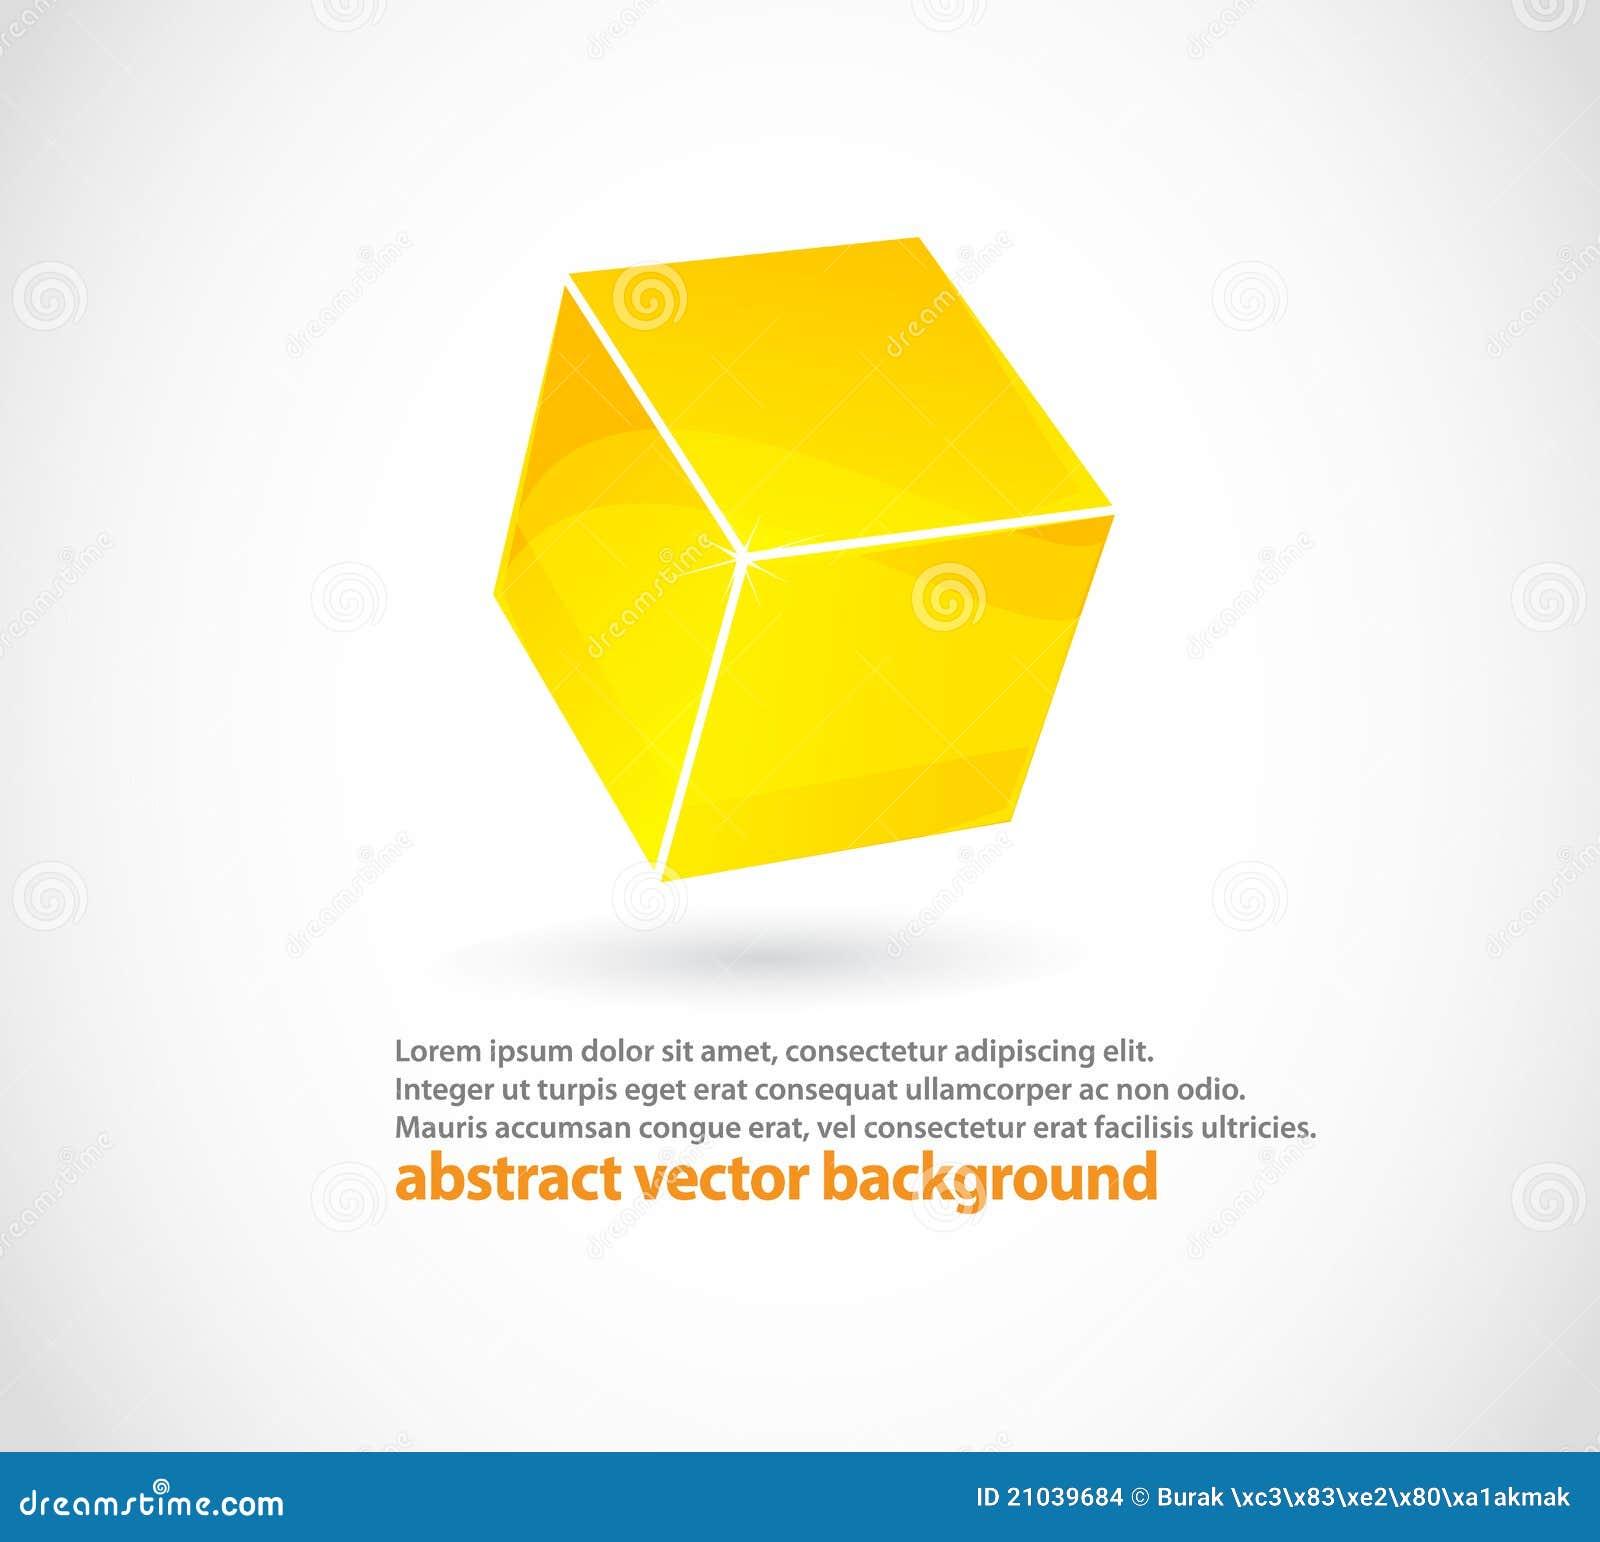 Abstract cube logo